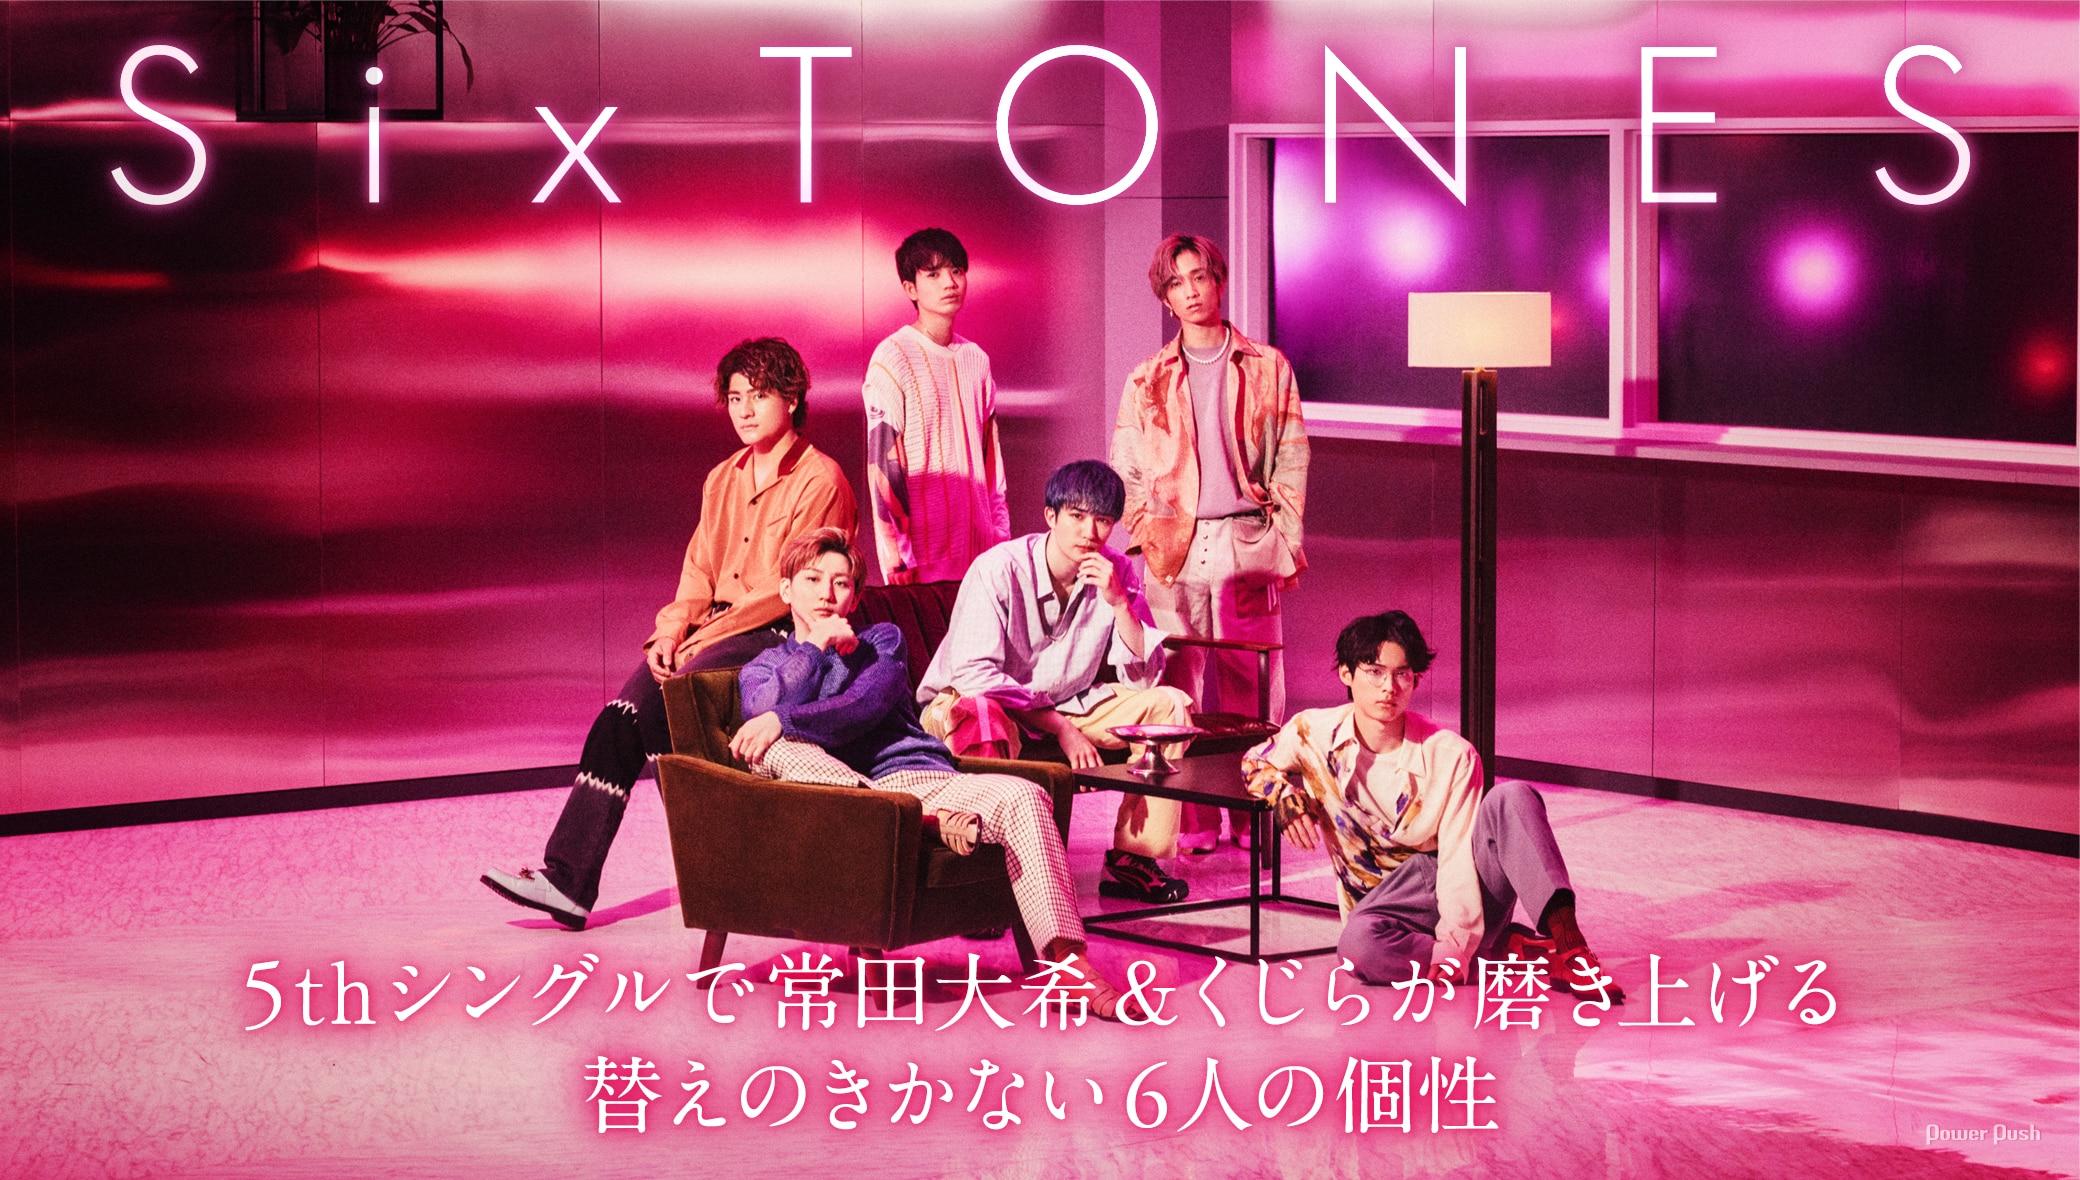 SixTONES|5thシングルで常田大希&くじらが磨き上げる 替えのきかない6人の個性